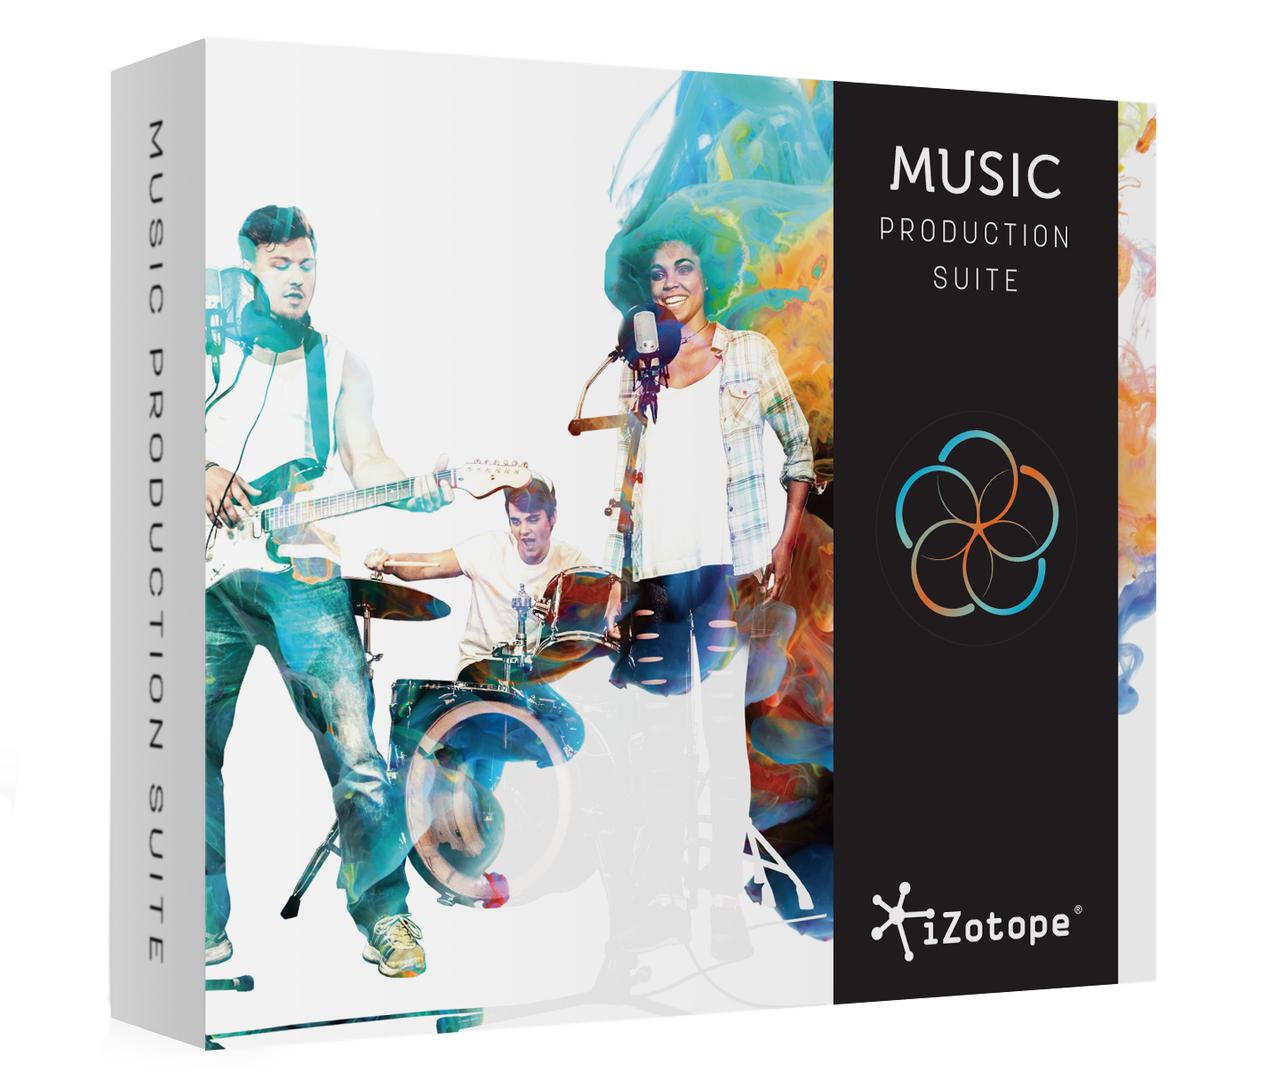 iZotope Music Production Suite Software Bundle Instant Rebate